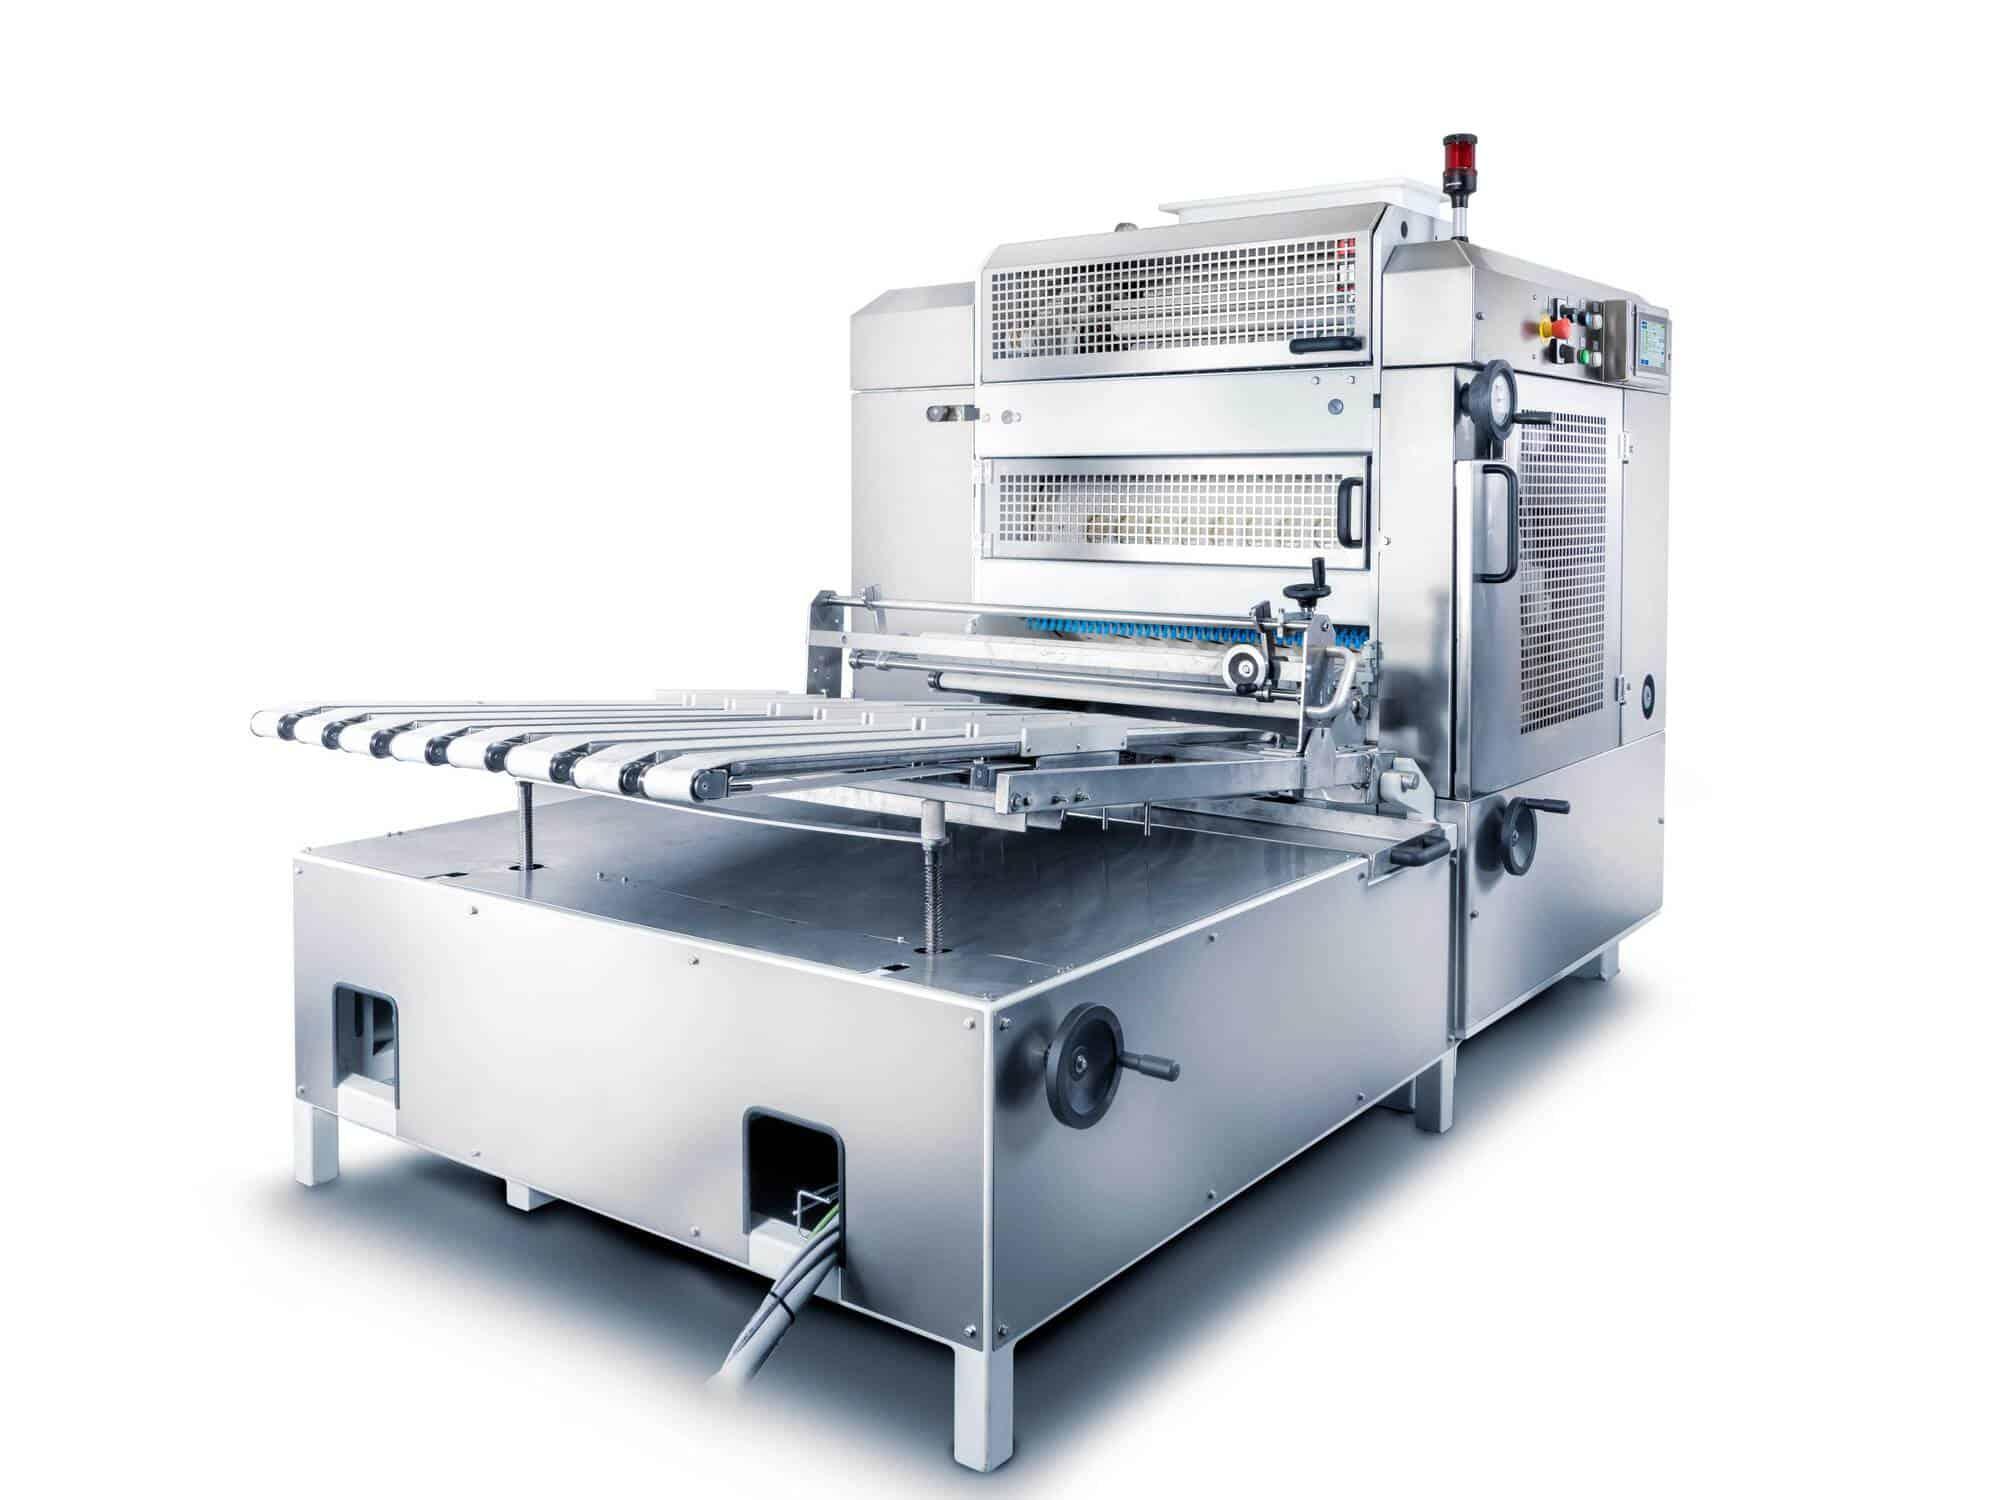 Used Winkler Admiral Divider/Rounder | Industrial Bakery Equipment